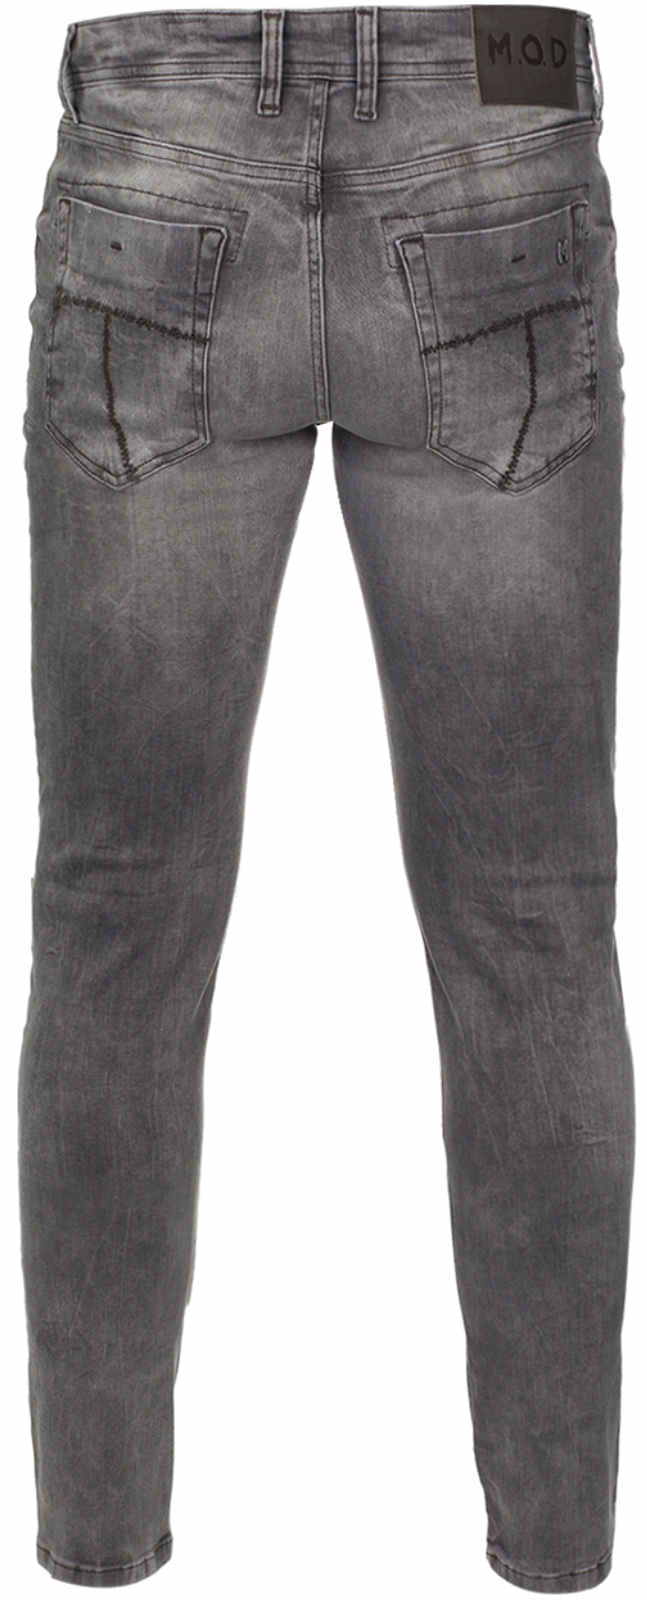 Fit o Nos Neu Slim 1003 Denim Jeans Leg Cornell d Stretch Herren M Mod Tuyau gwZPd